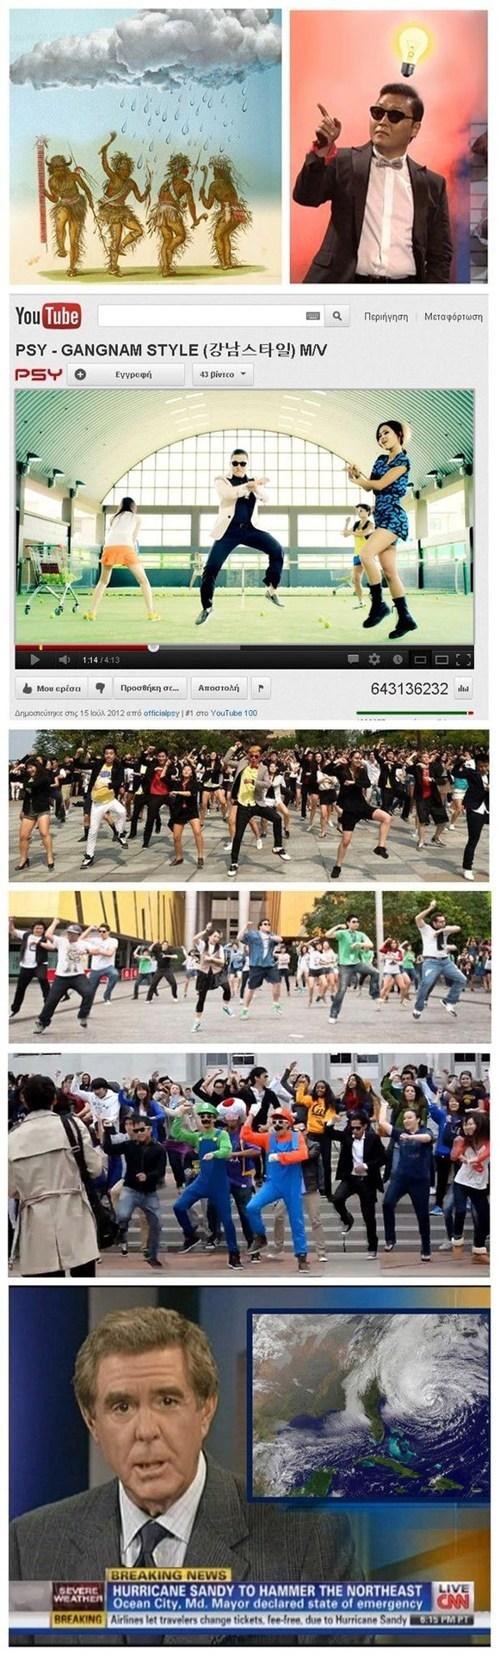 Rain Dance gangnam style psy hurricane sandy - 6752054016